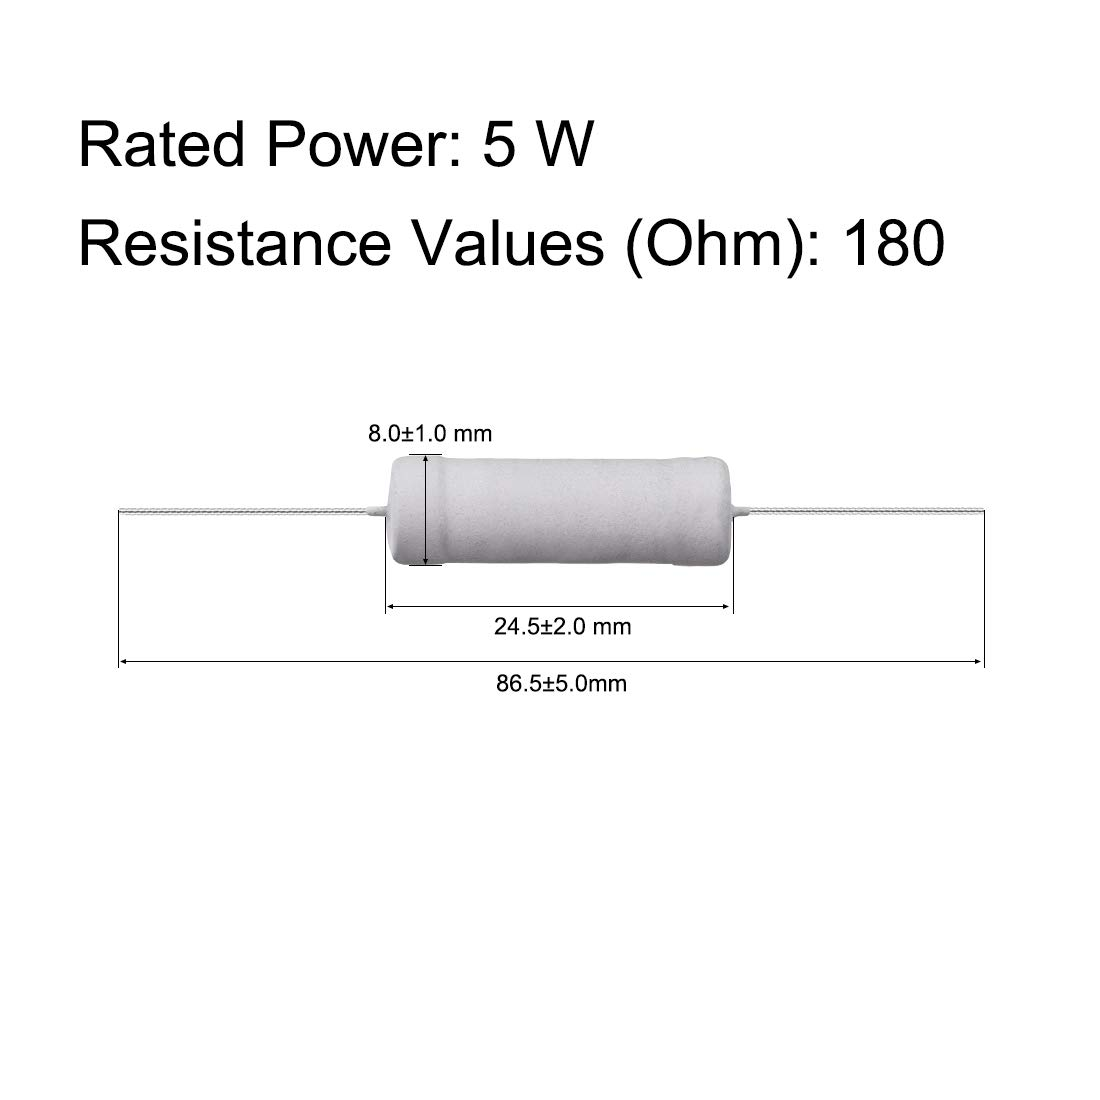 Metalloxid Film Widerstand 5 Watt Axiales Kabel 56 Ohm /±5/% Toleranz sourcing map 10 Stk